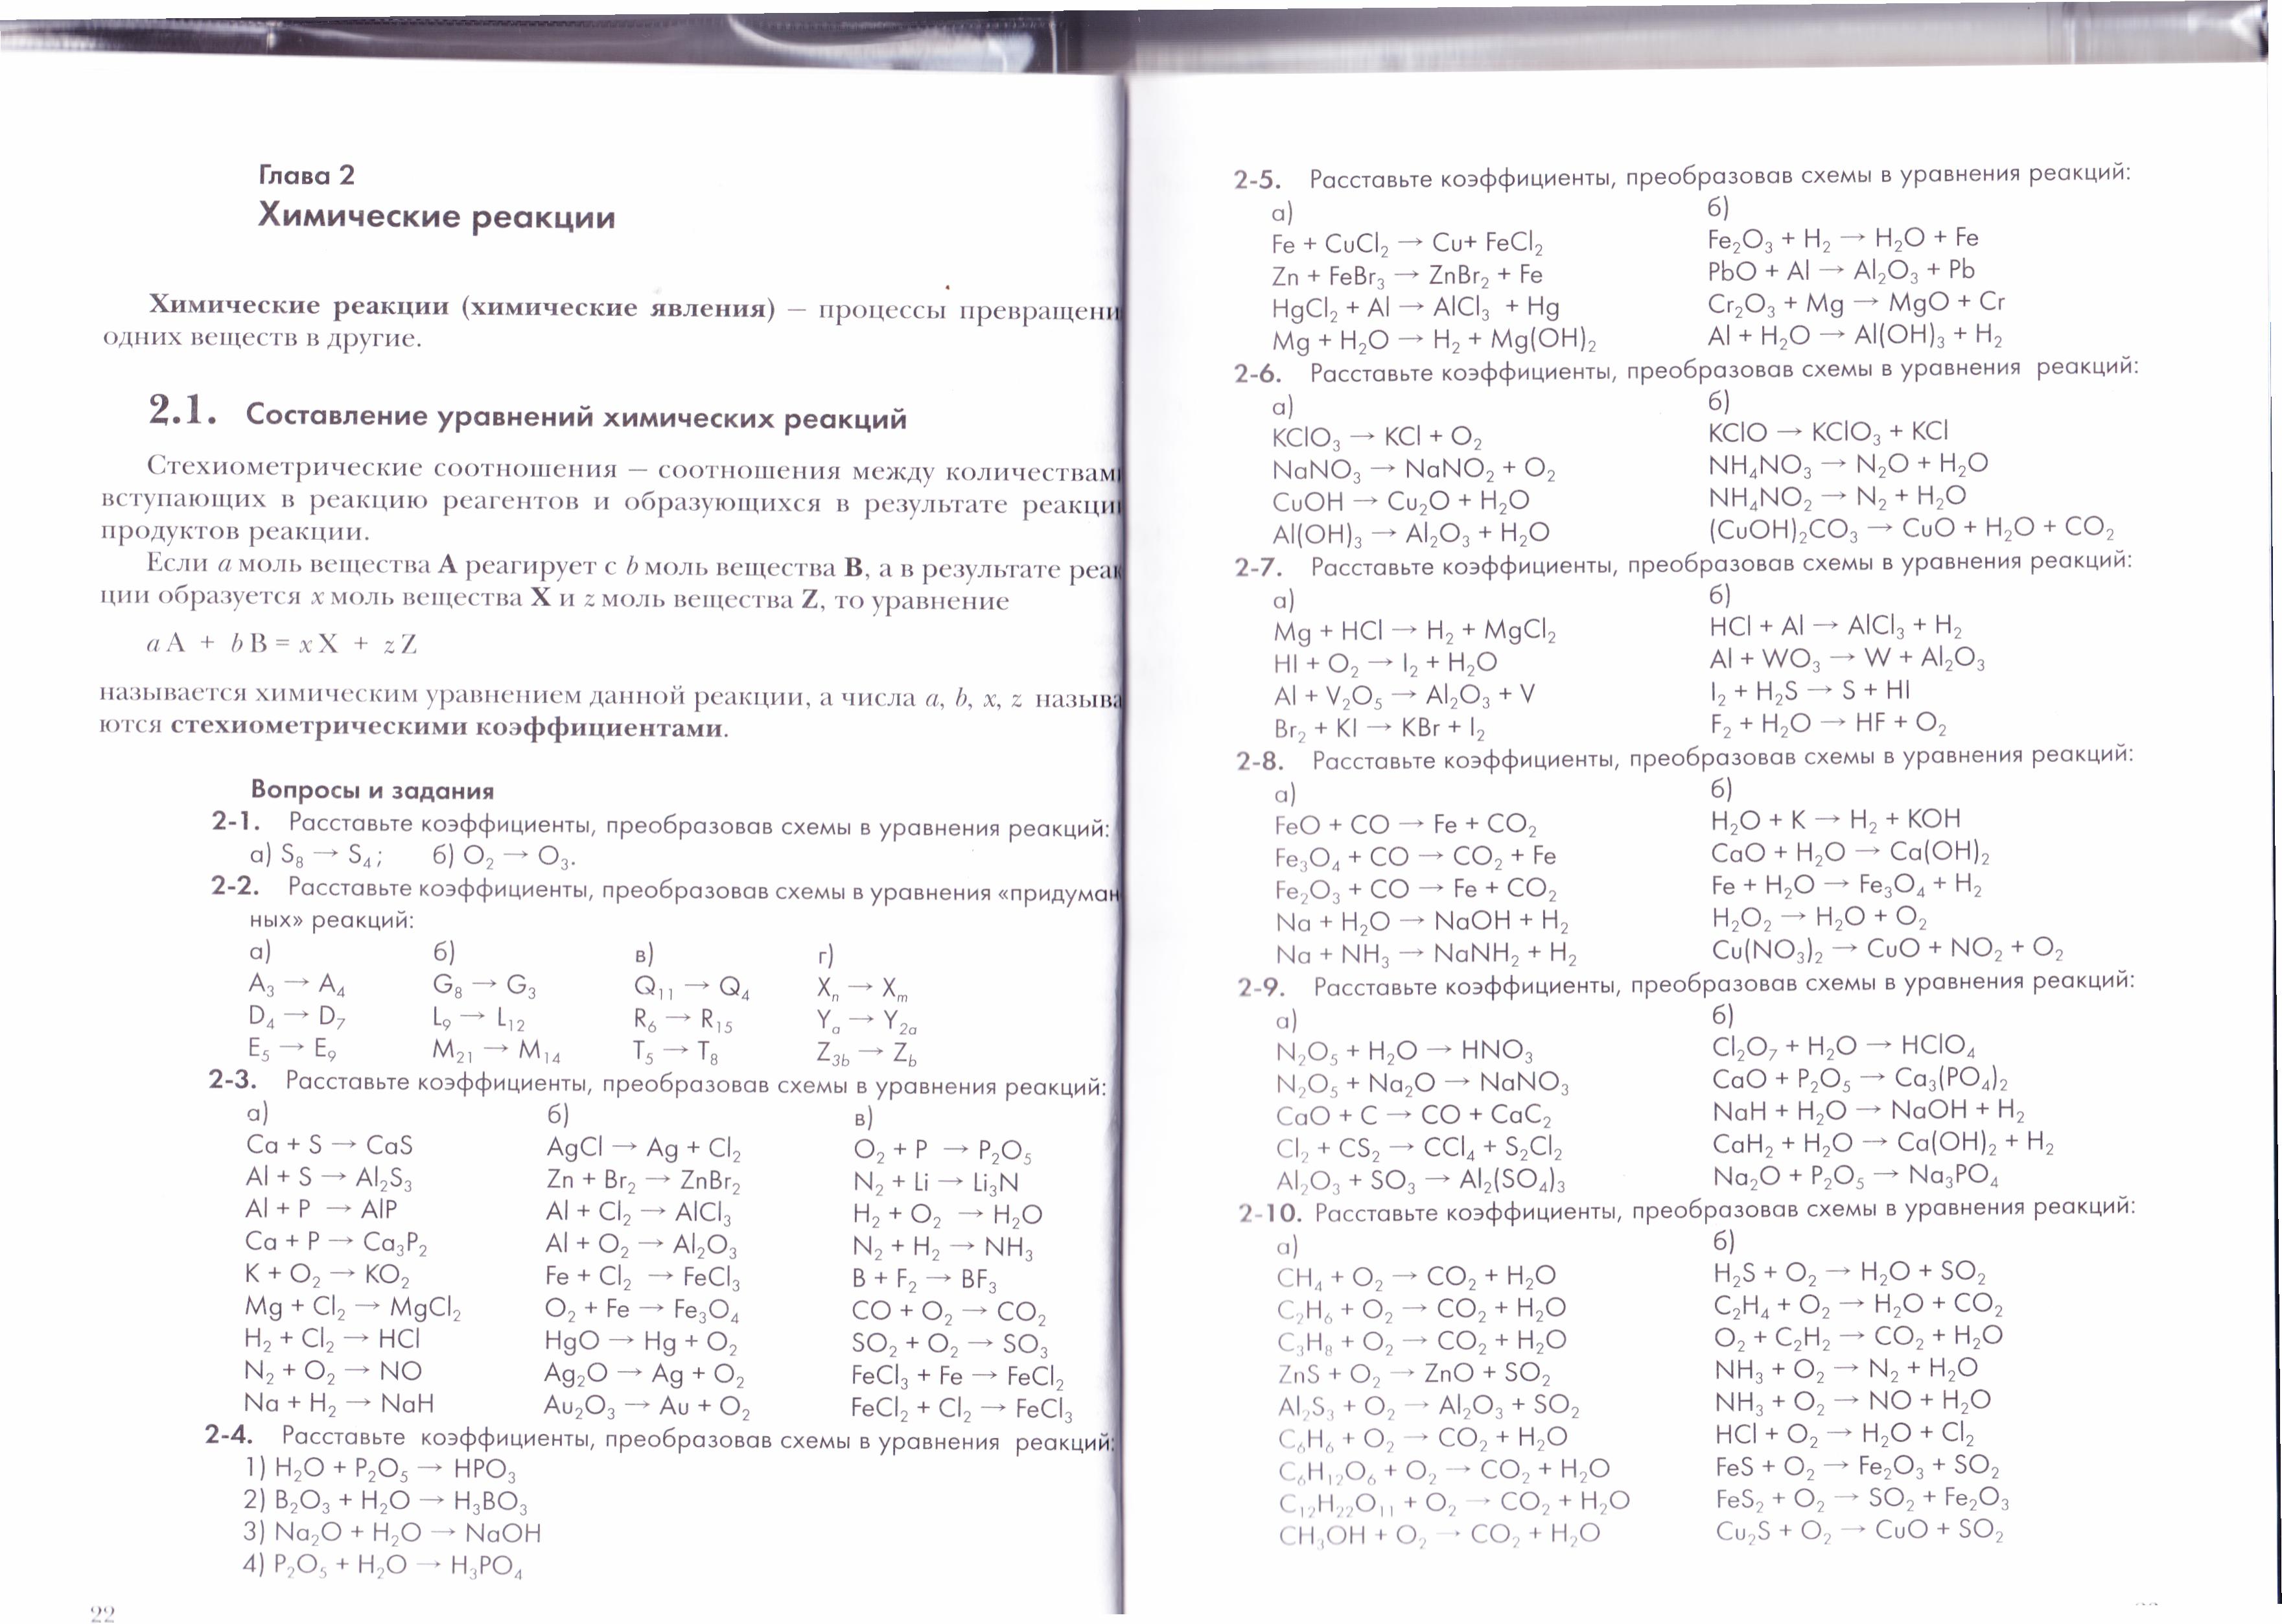 C:\Documents and Settings\Владелец\Рабочий стол\10001.tif